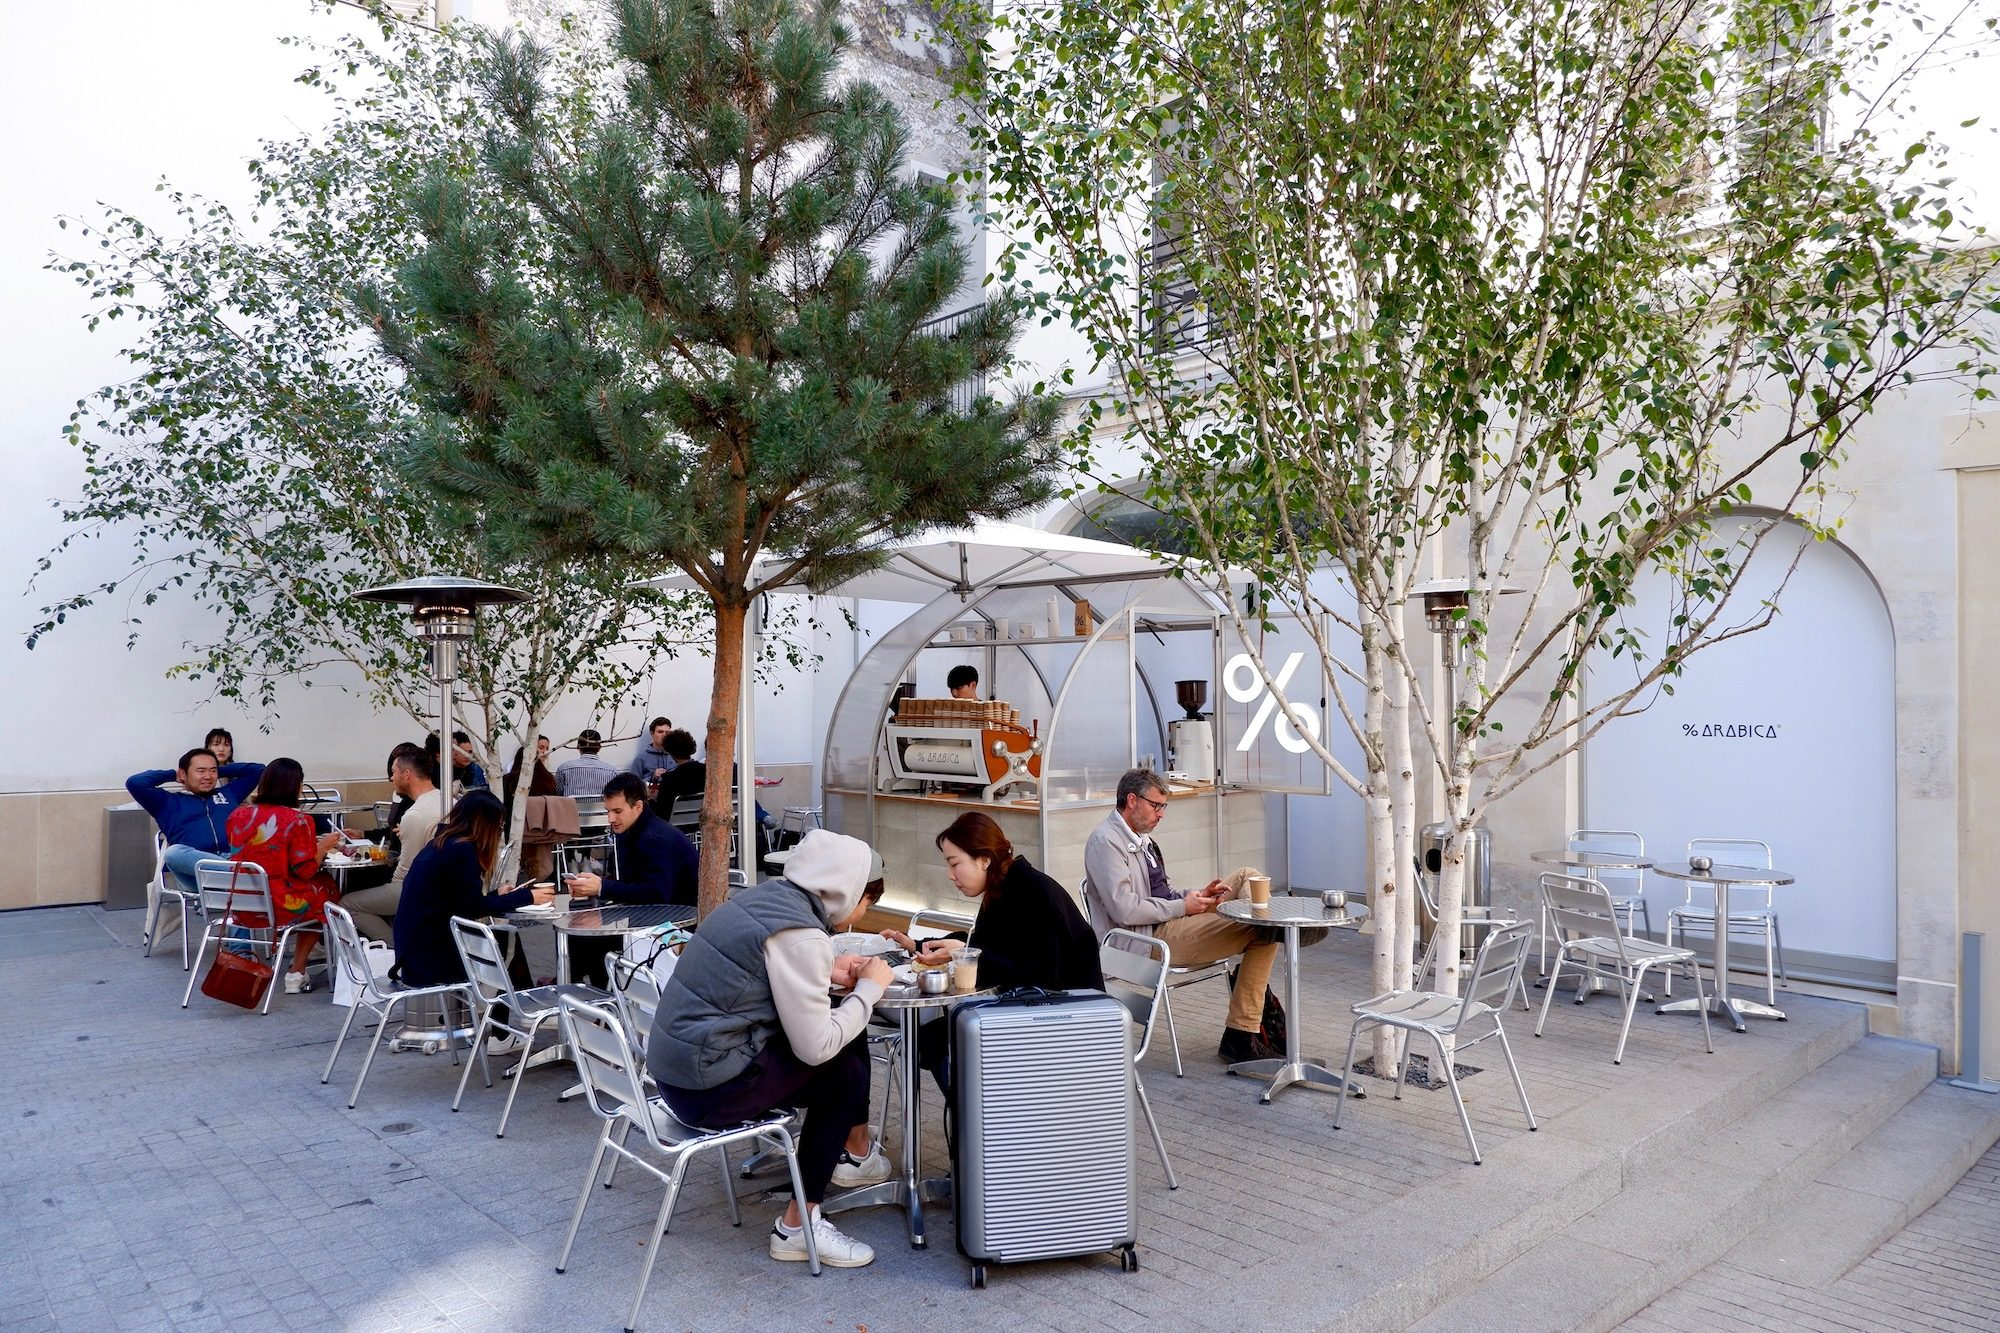 HiP Paris Blog explores the chic Beaupassage in the 7eme